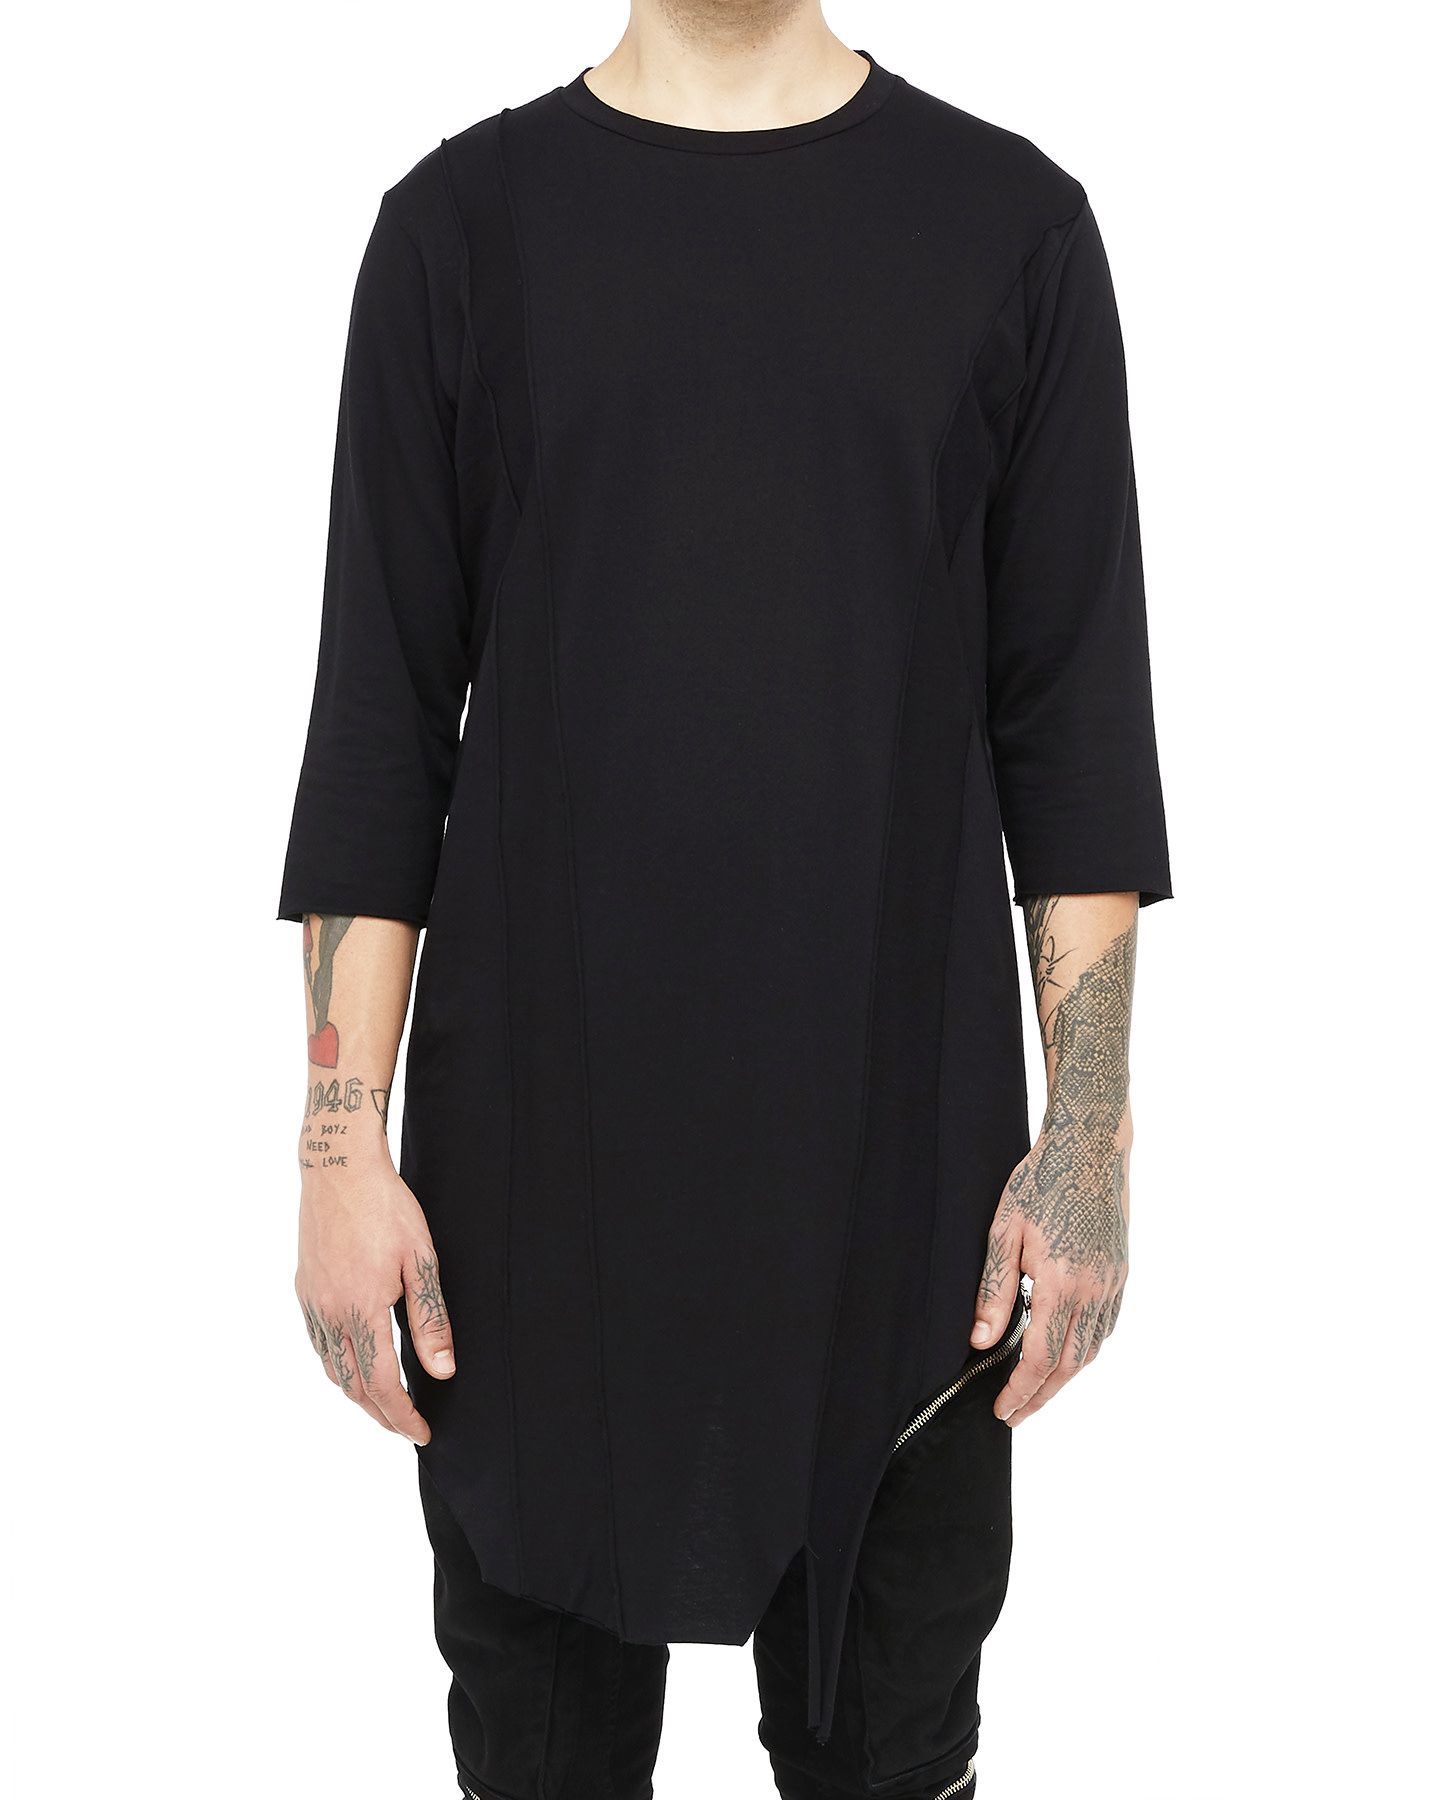 LONG BANDED T-SHIRT - BLACK